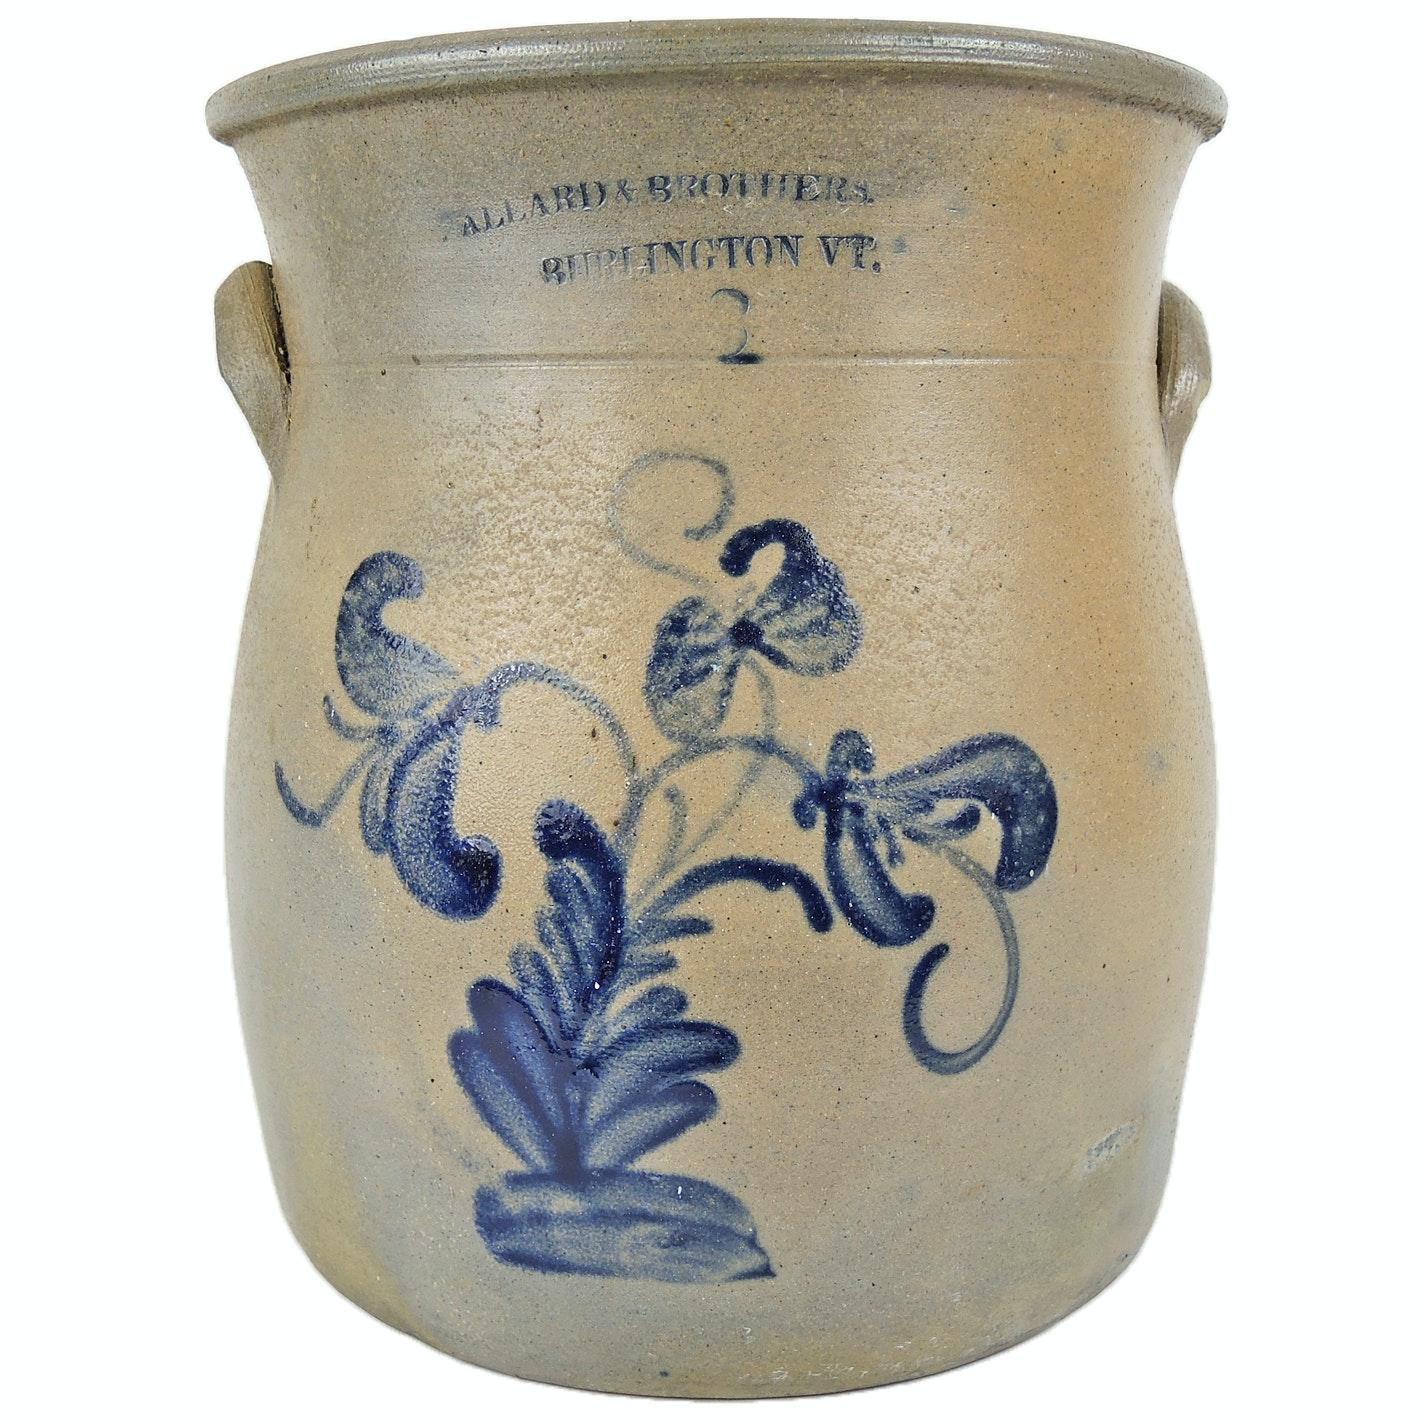 Ballard & Brothers 1870s Cobalt Decorated Stoneware Crock